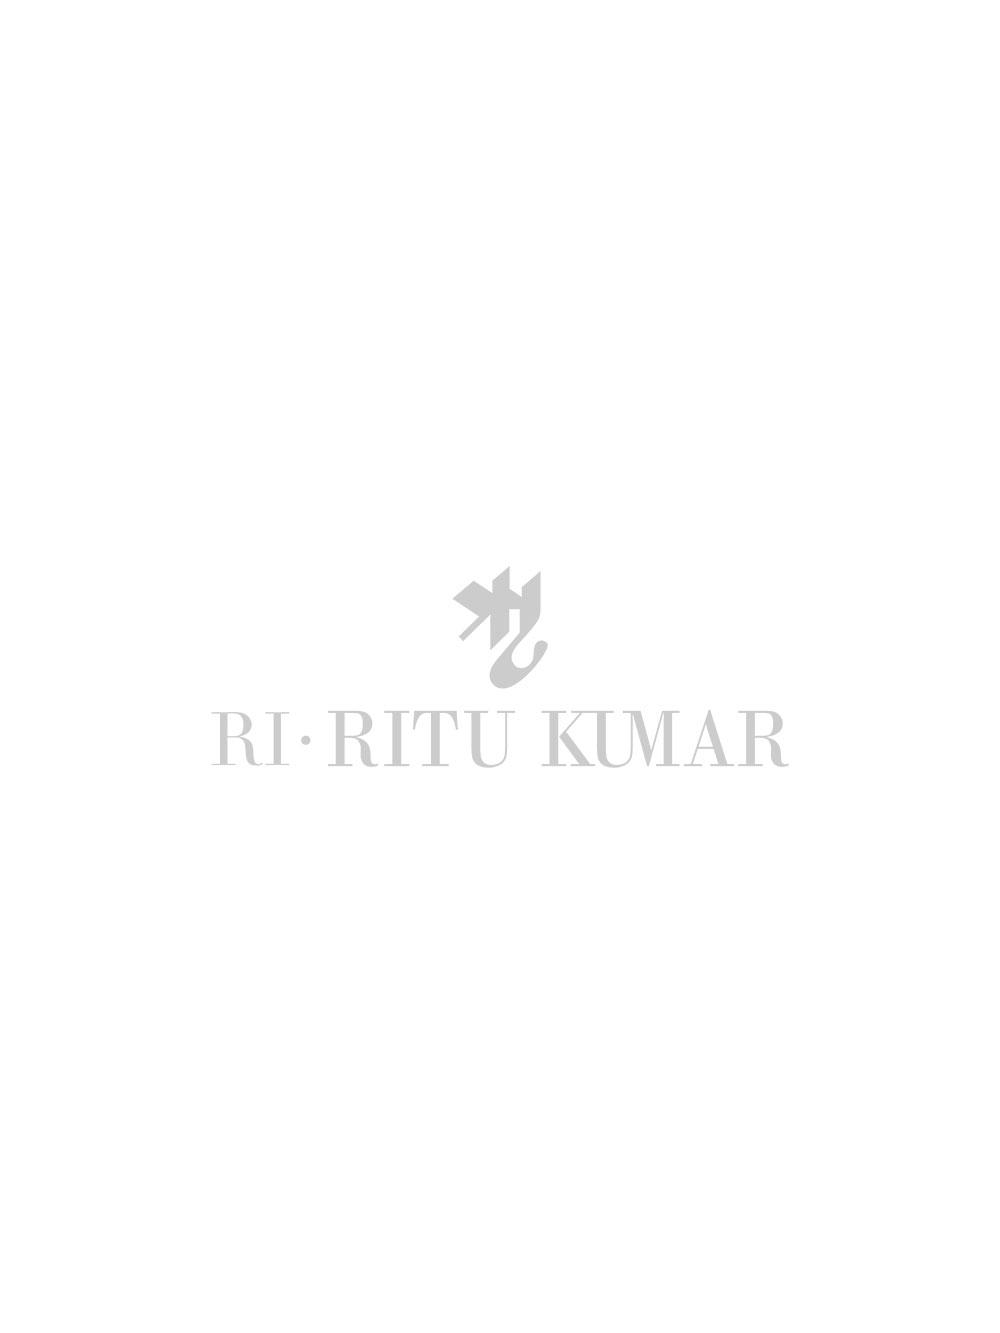 Indian Bridal Outfits by Ritu Kumar